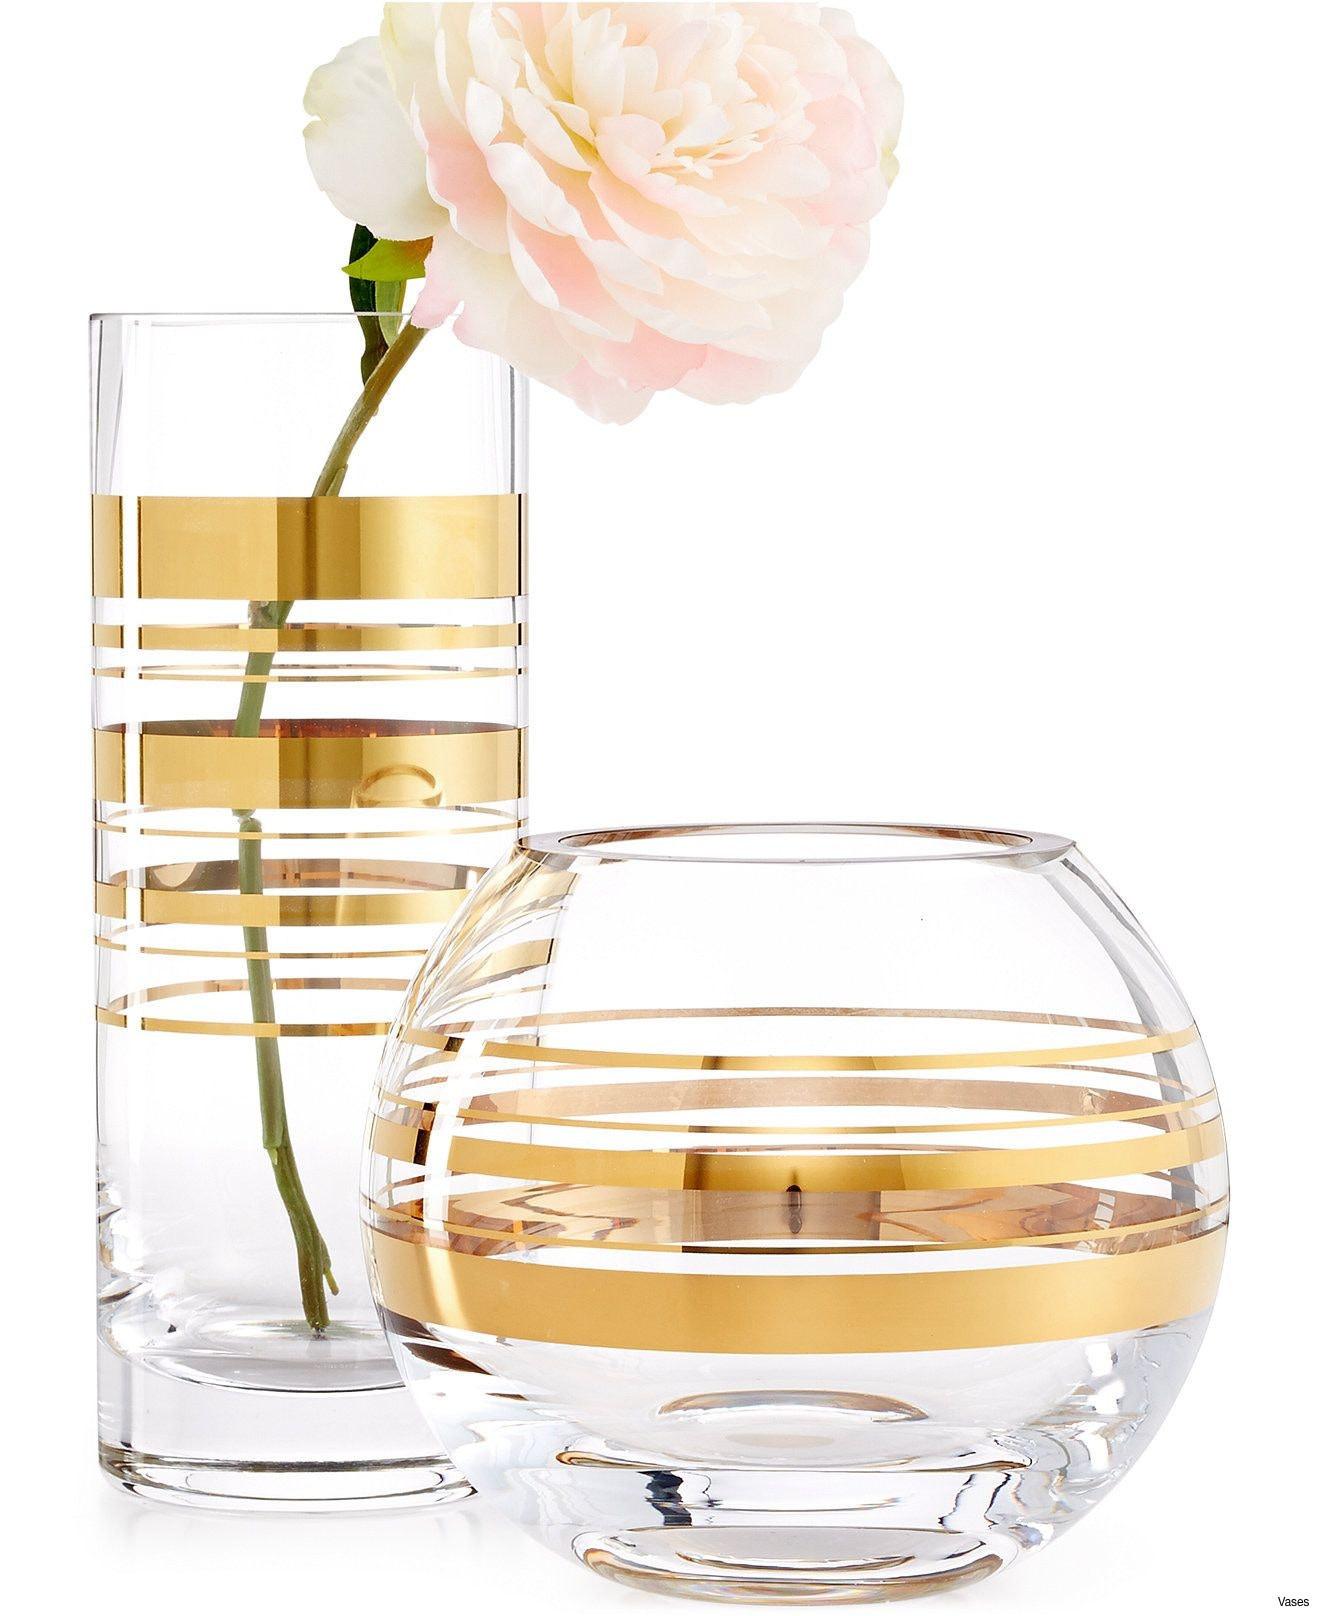 crystal clear vase of 10 fresh crystal vase bogekompresorturkiye com intended for kate spade kate spade archives roorbongs from crystal vase